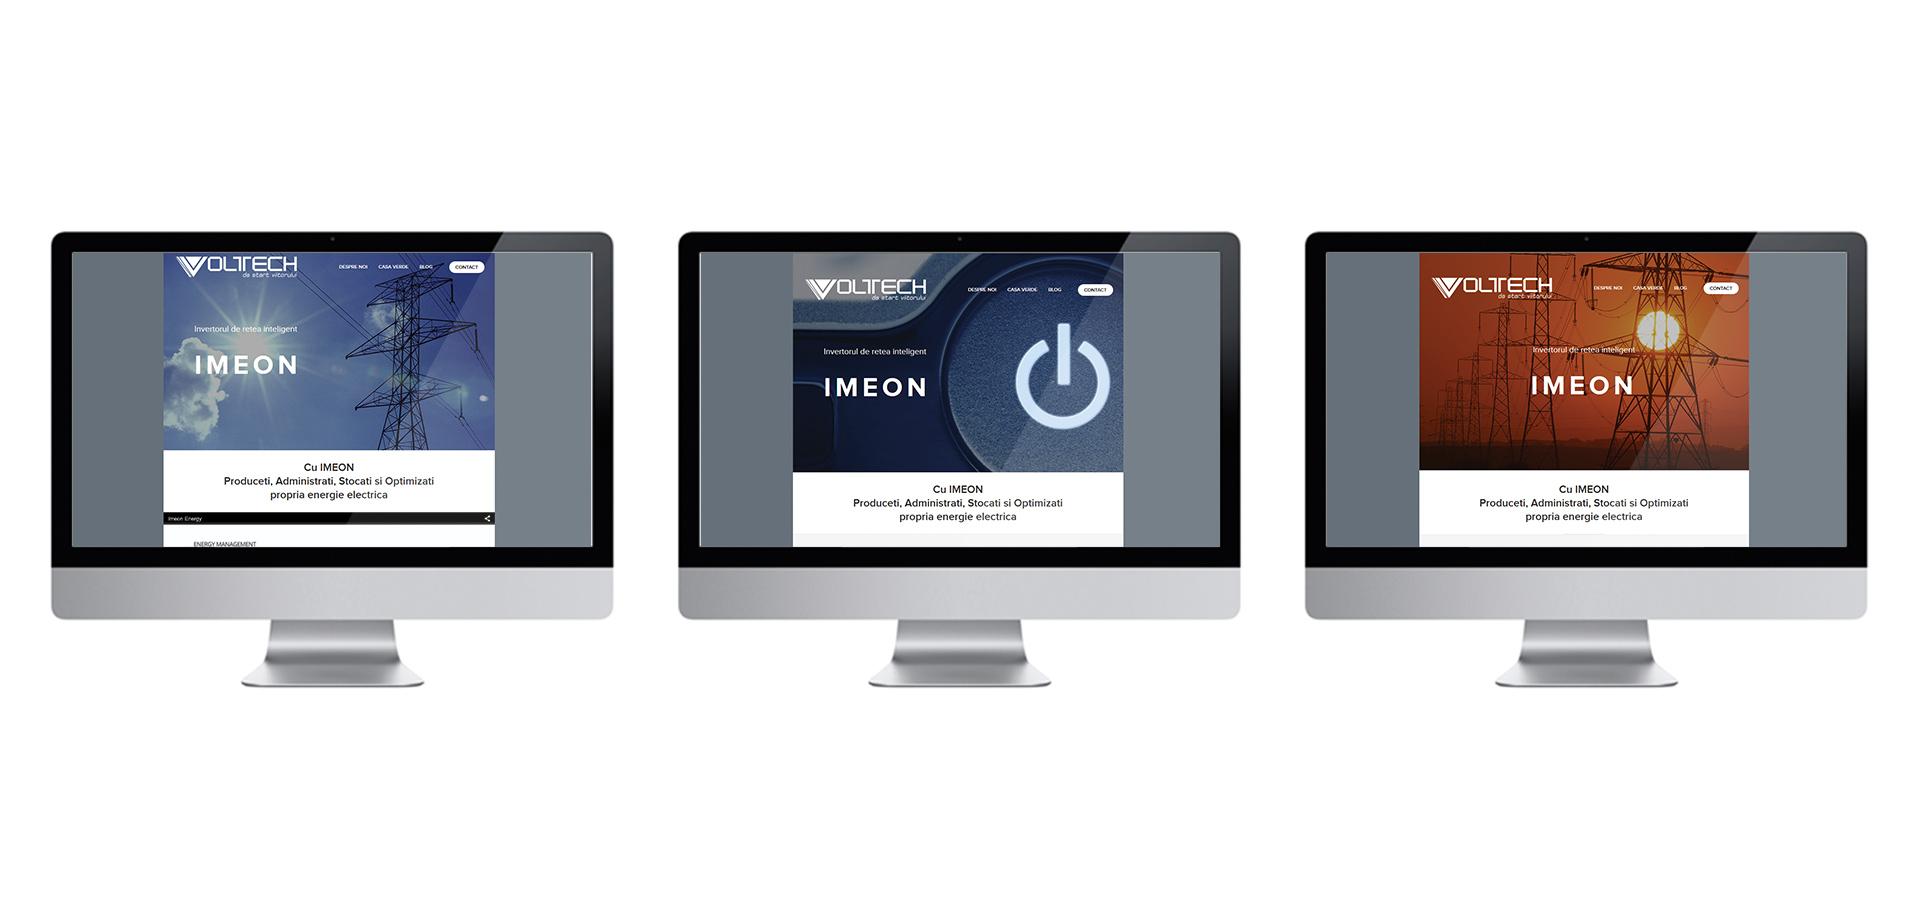 https://www.optibit.ro/wp-content/uploads/2018/11/voltech-newsletter-marketing-campaign.jpg